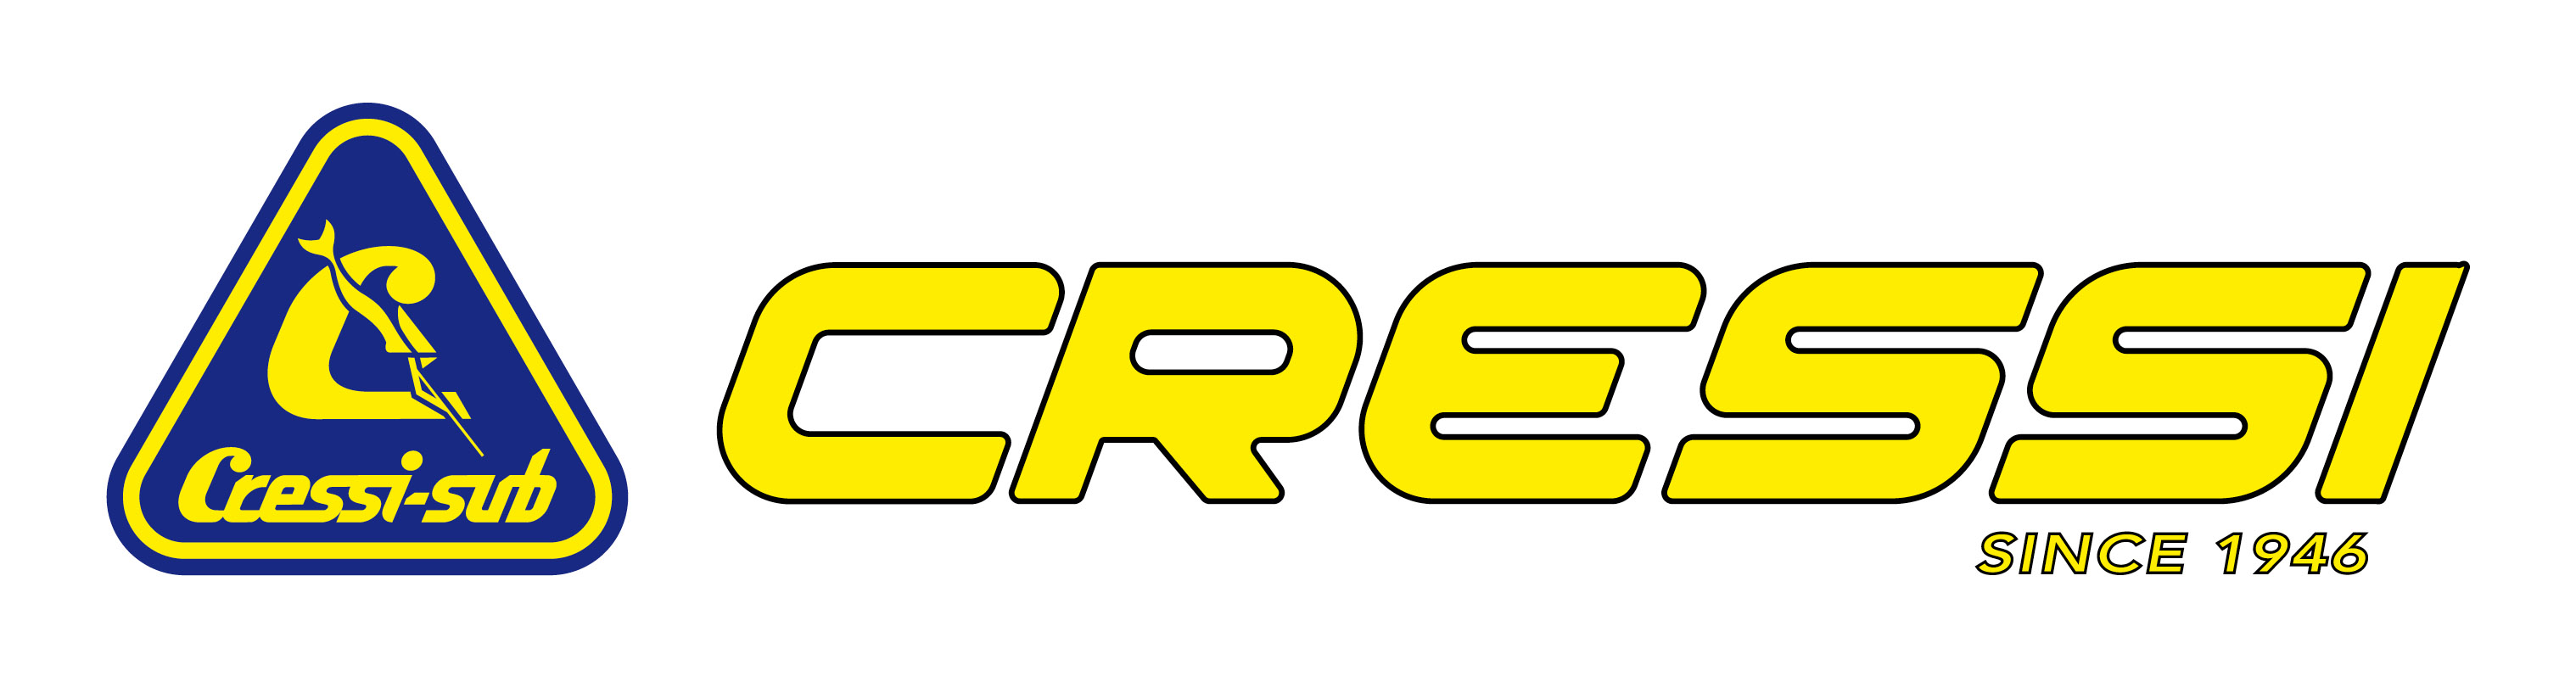 Харпун за подводен риболов CHEROKEE OPEN 100 см – Cressi